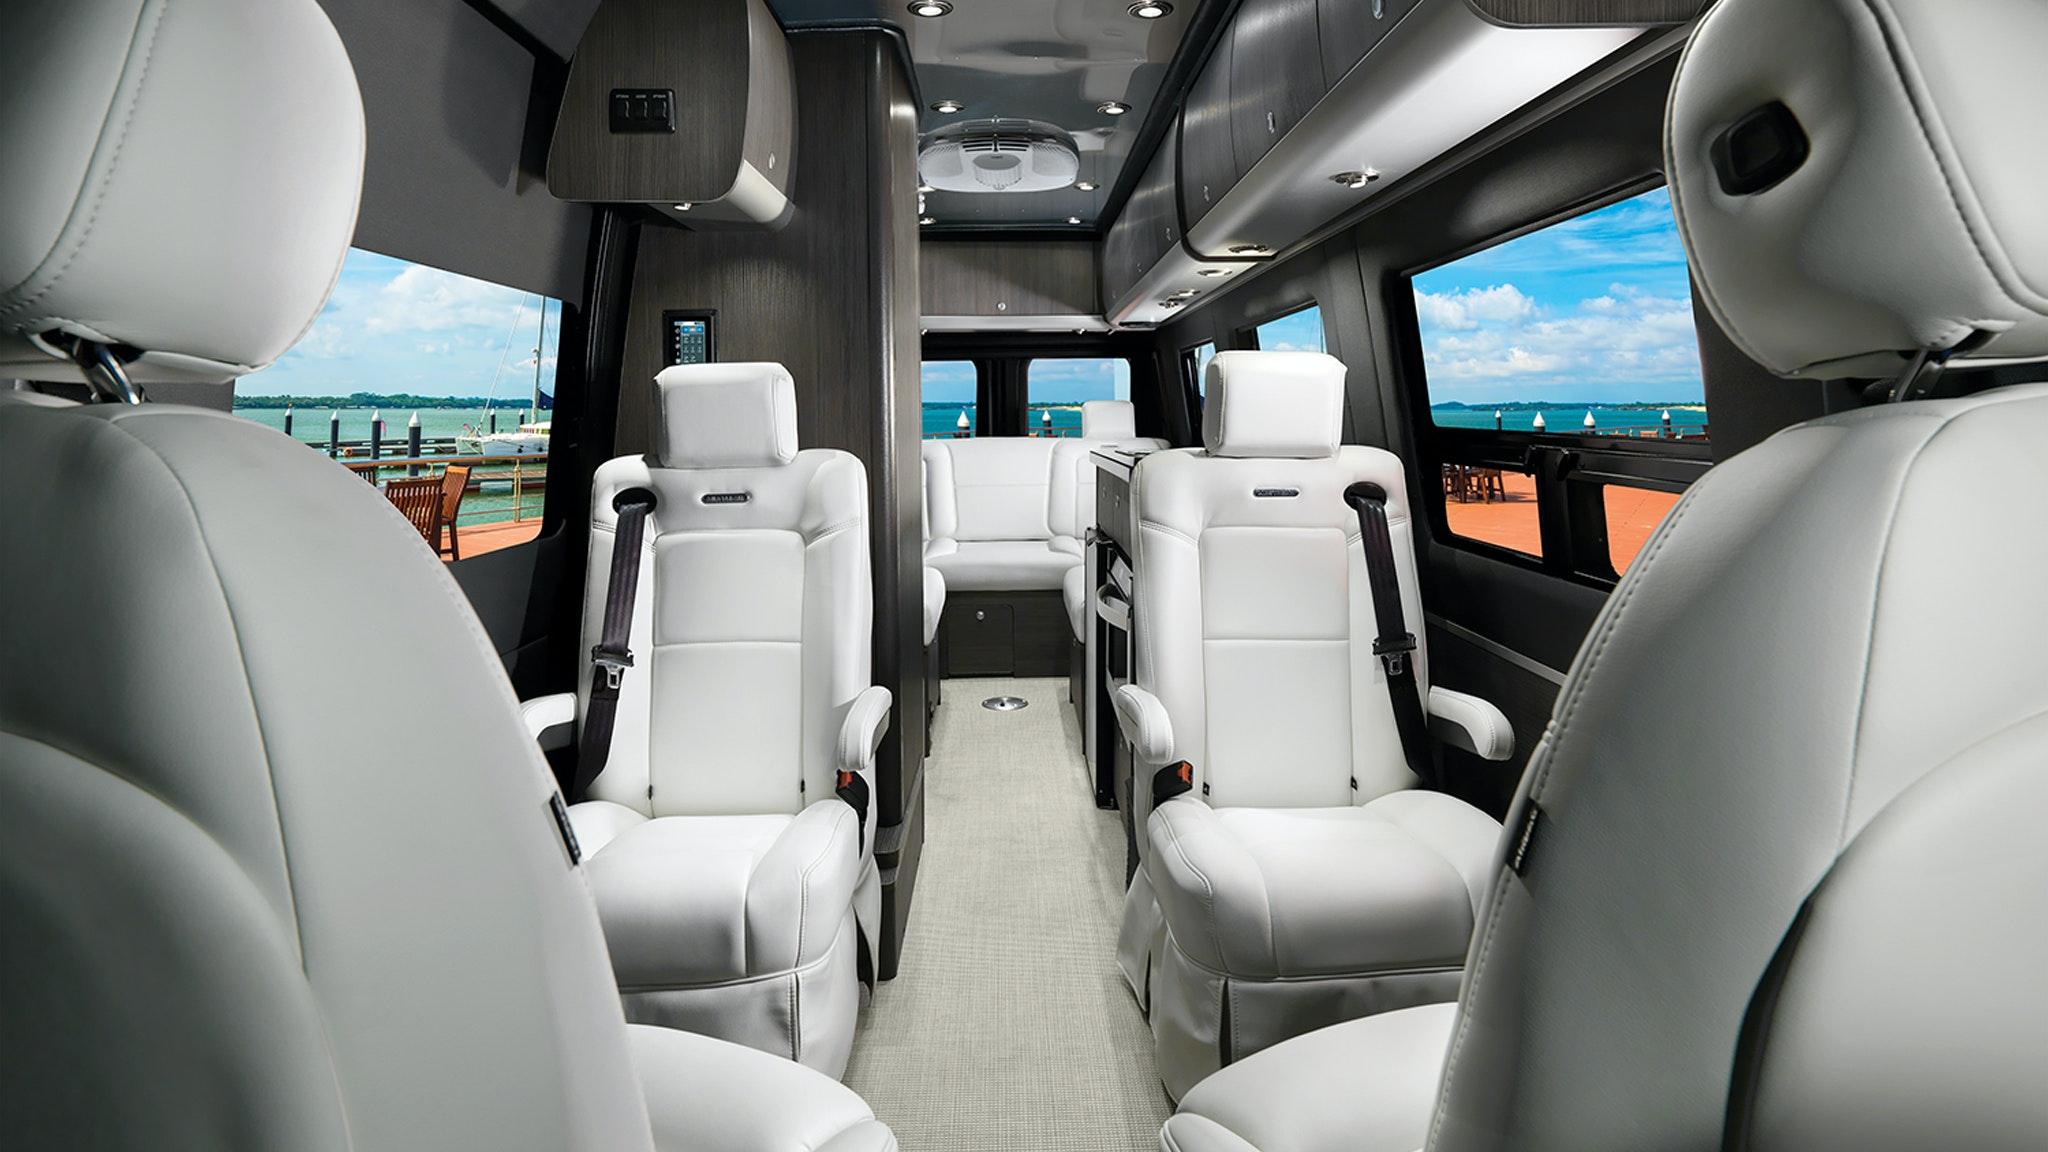 Airstream Touring Coach 2021 Interstate 24GL Interior